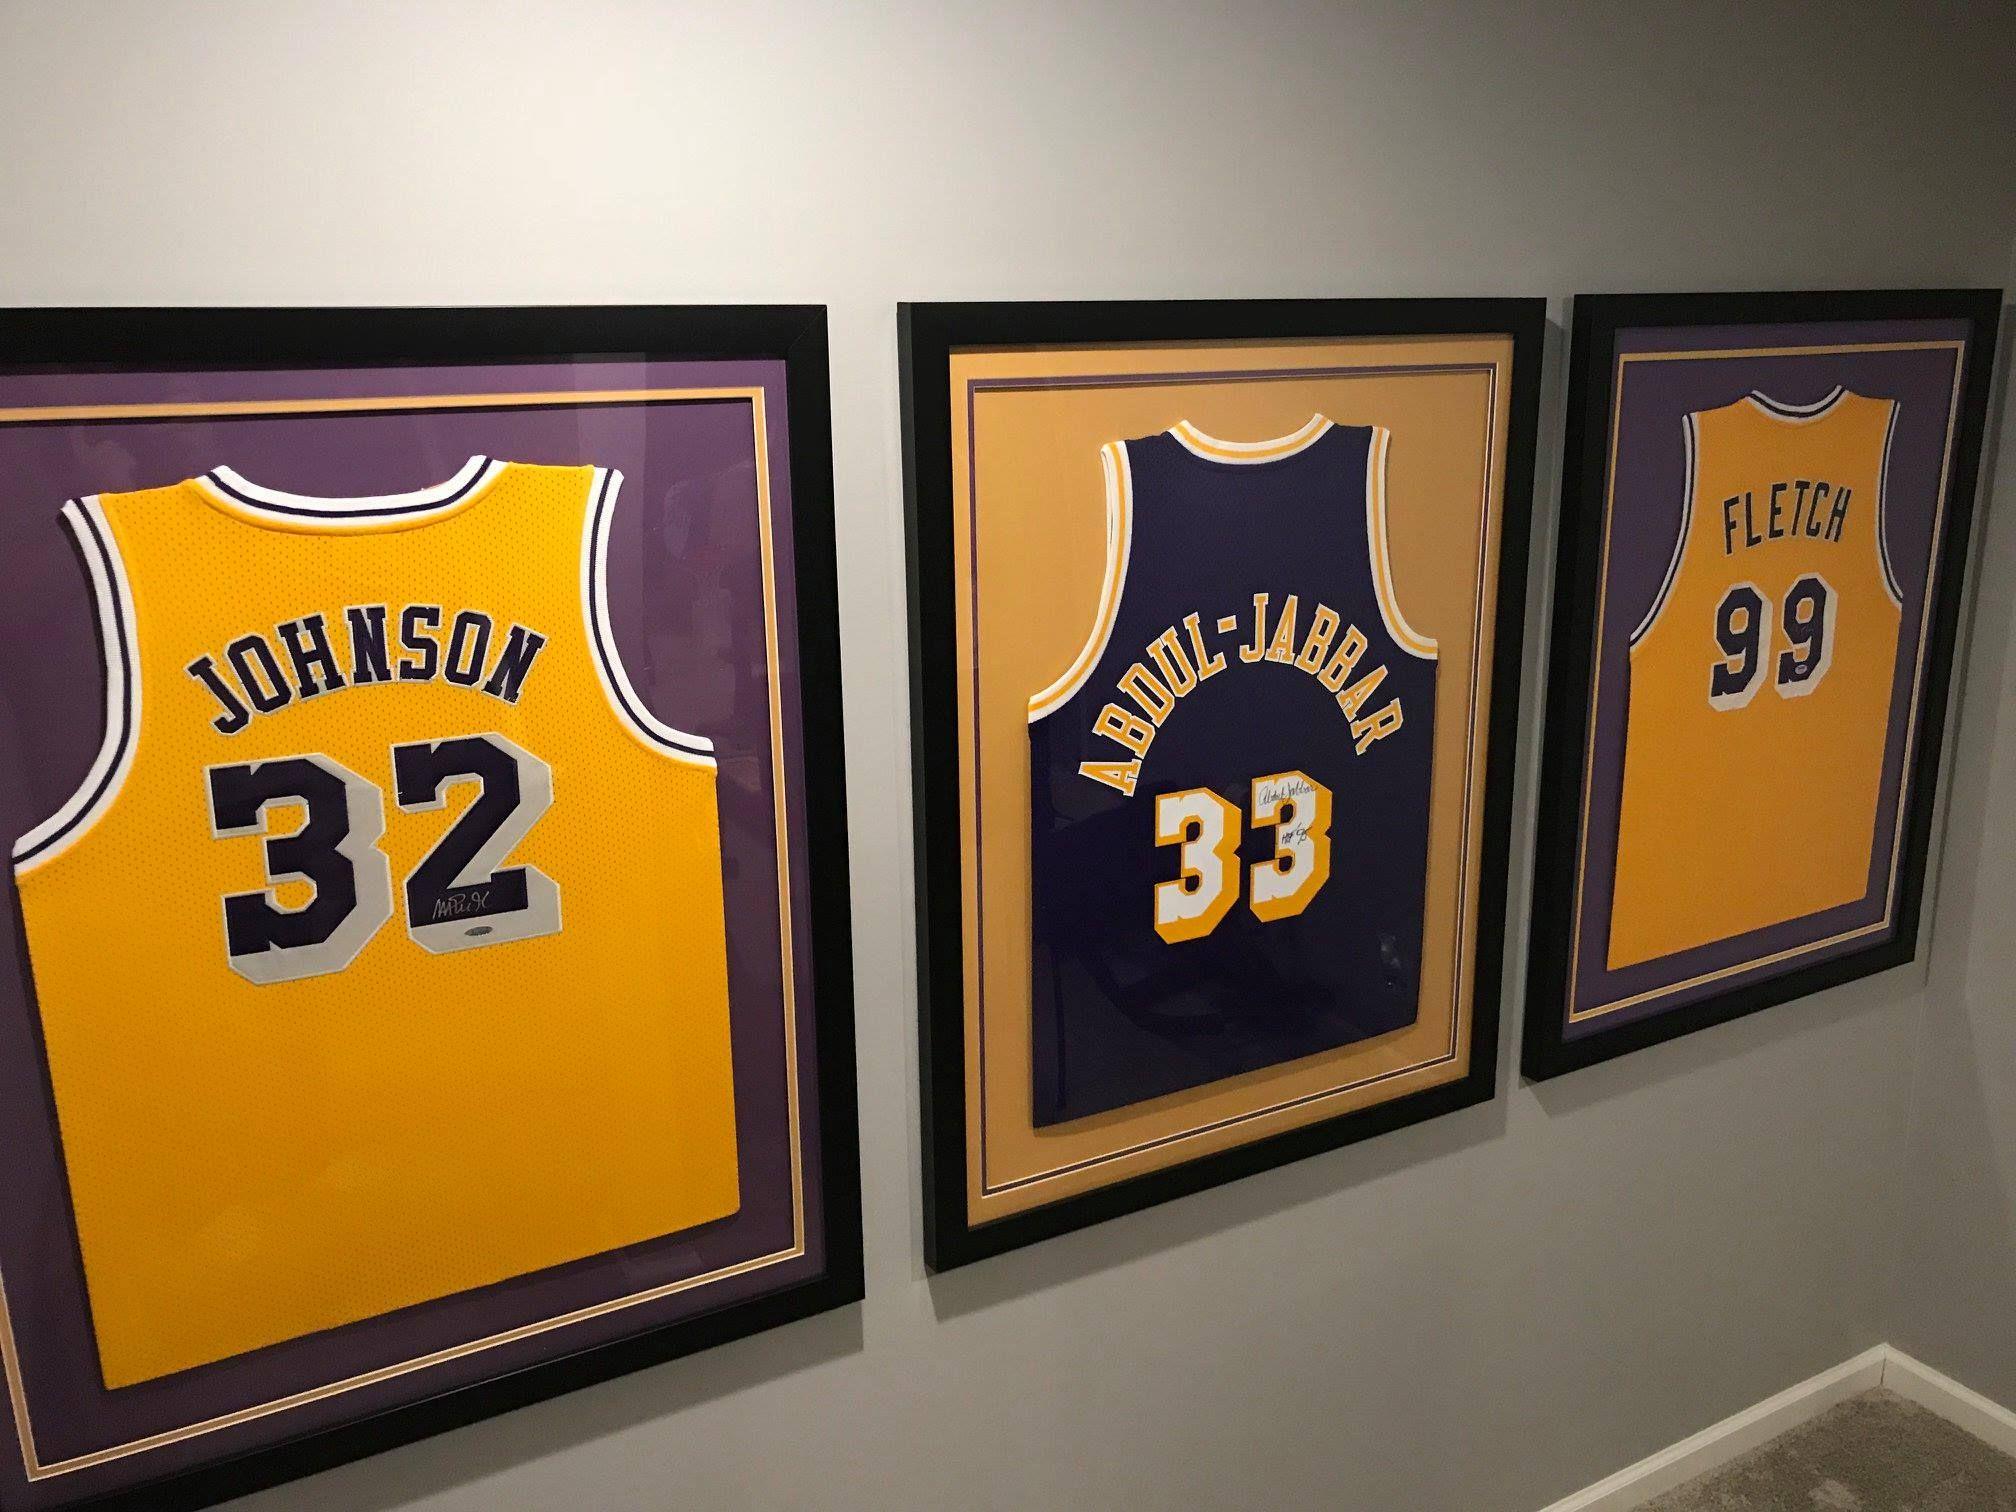 18c37c6ad  MagicJohnson  KareemAbdulJabbar  Fletch  Magic  Kareem  Lakers  LALakers   LosAngeles  NBA  framedjersey  jerseyframing